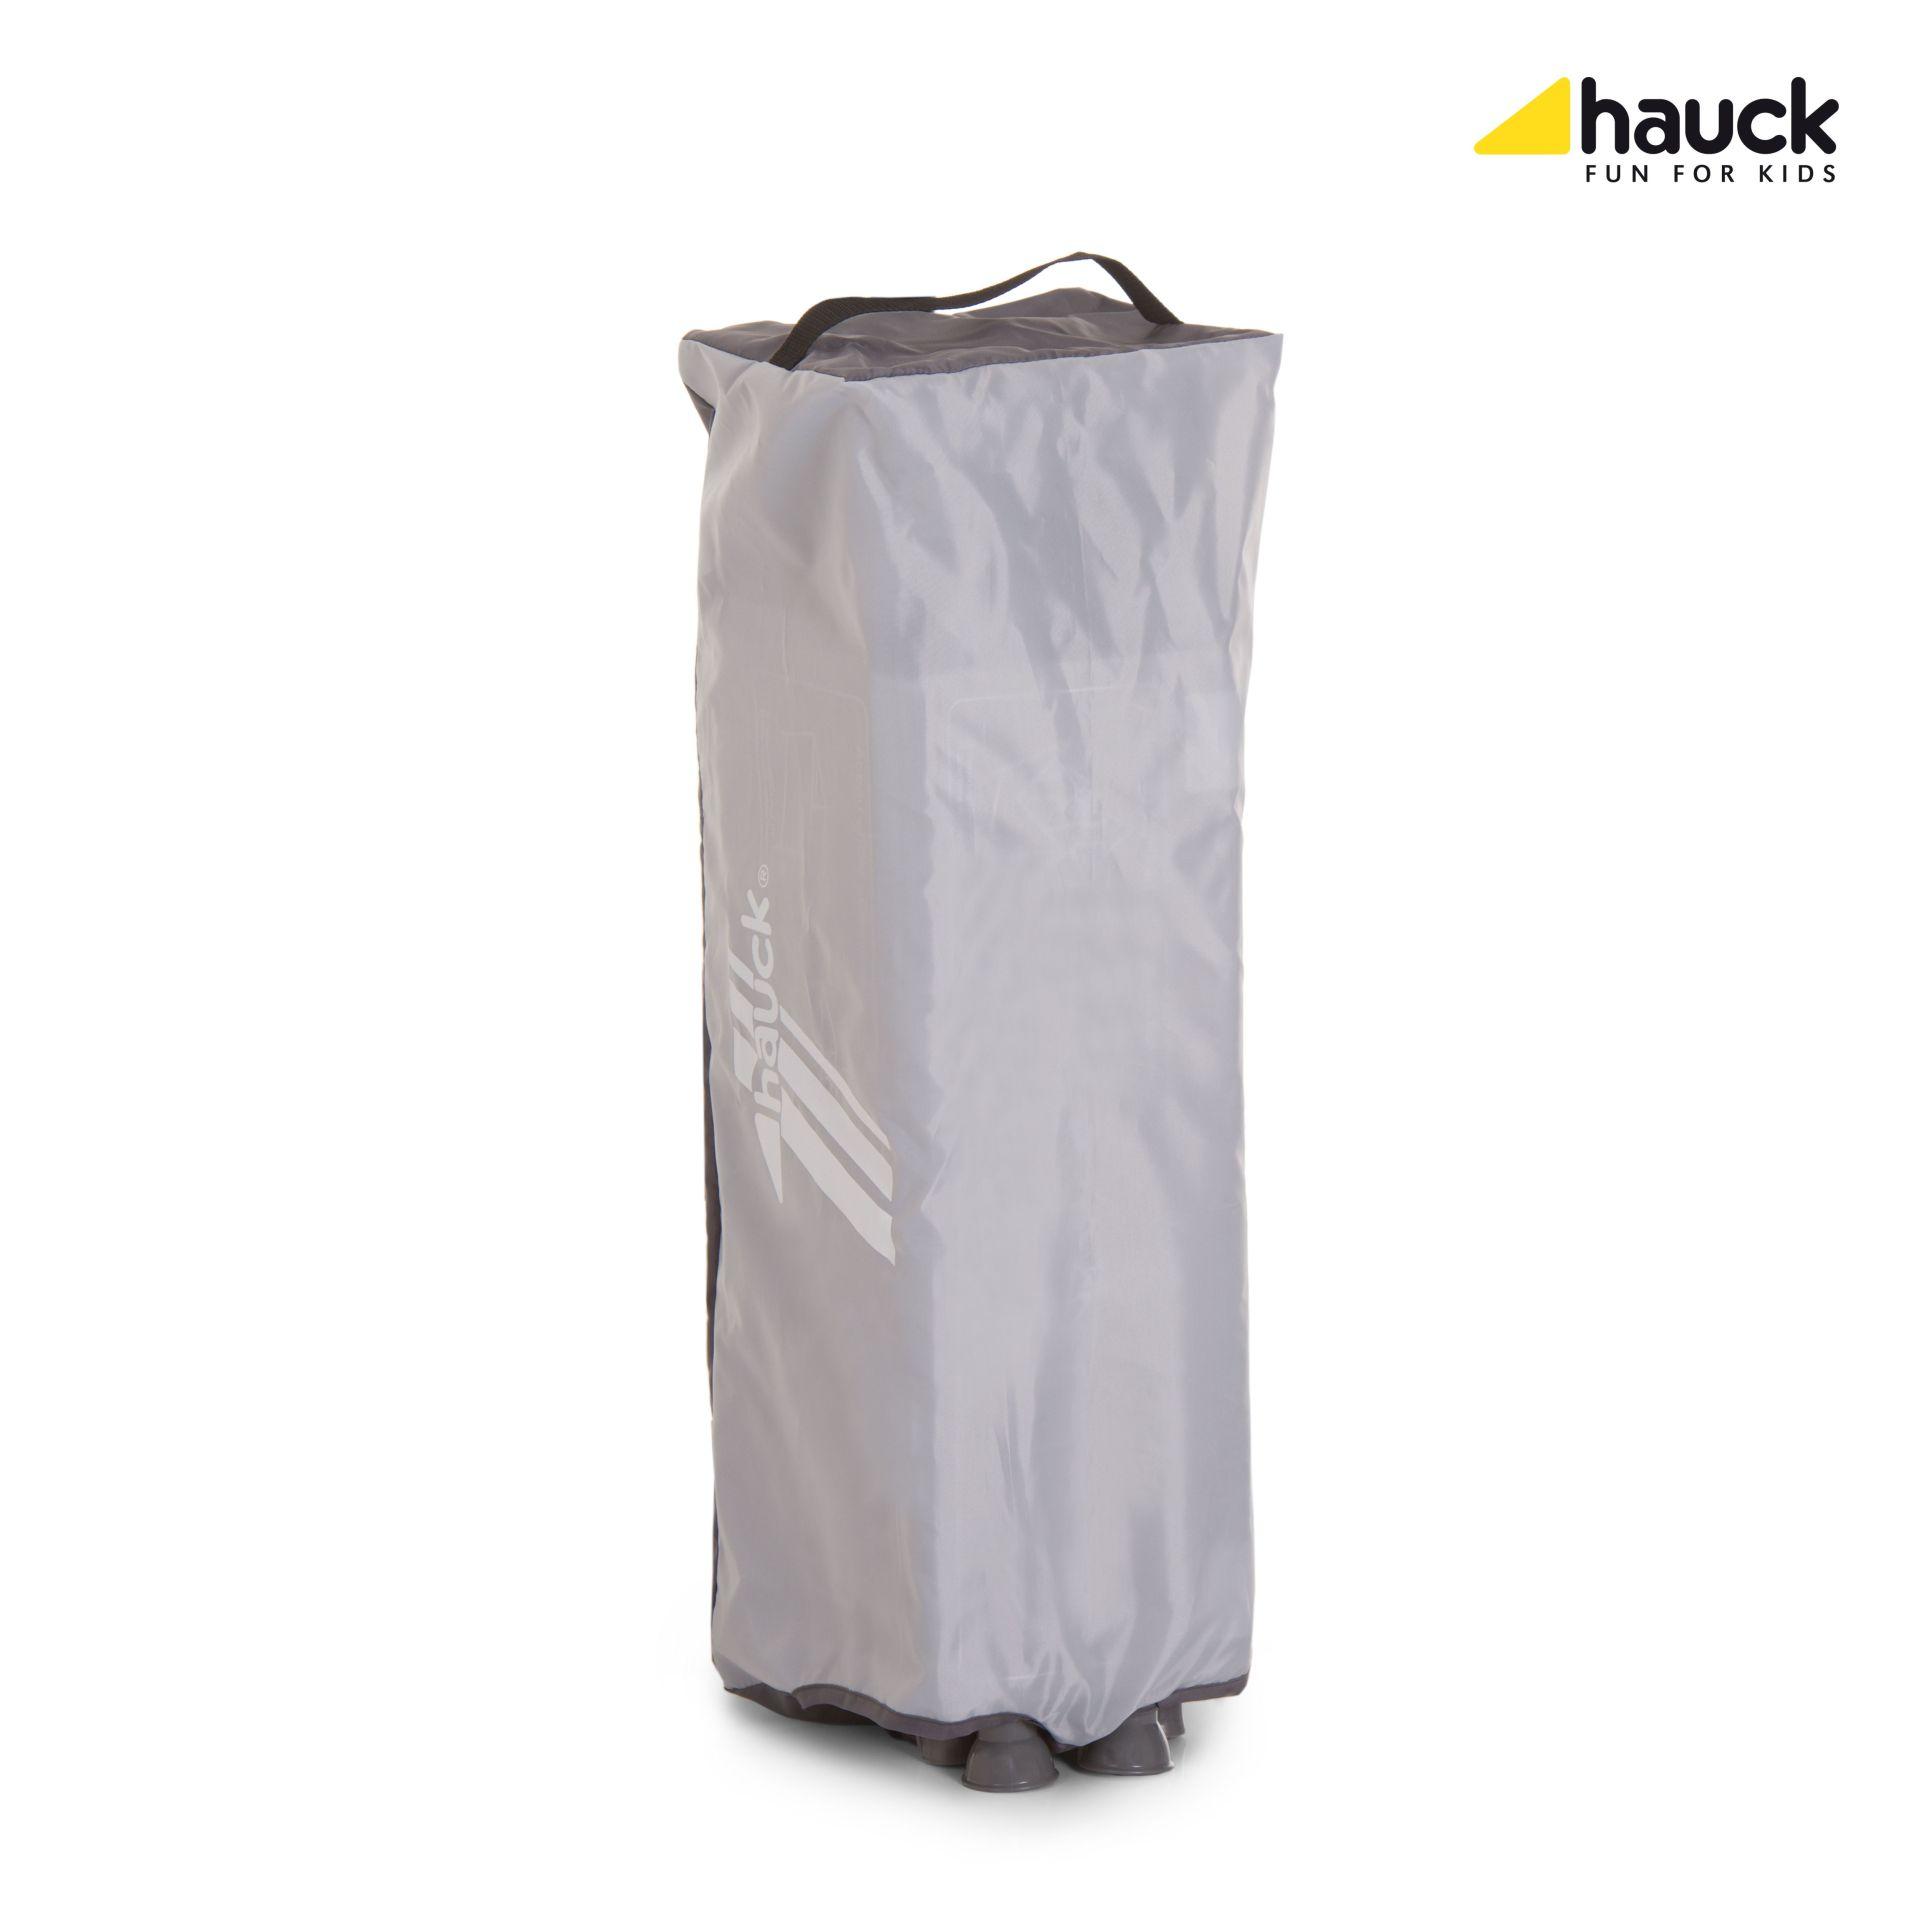 hauck sleep n play travel cot instructions